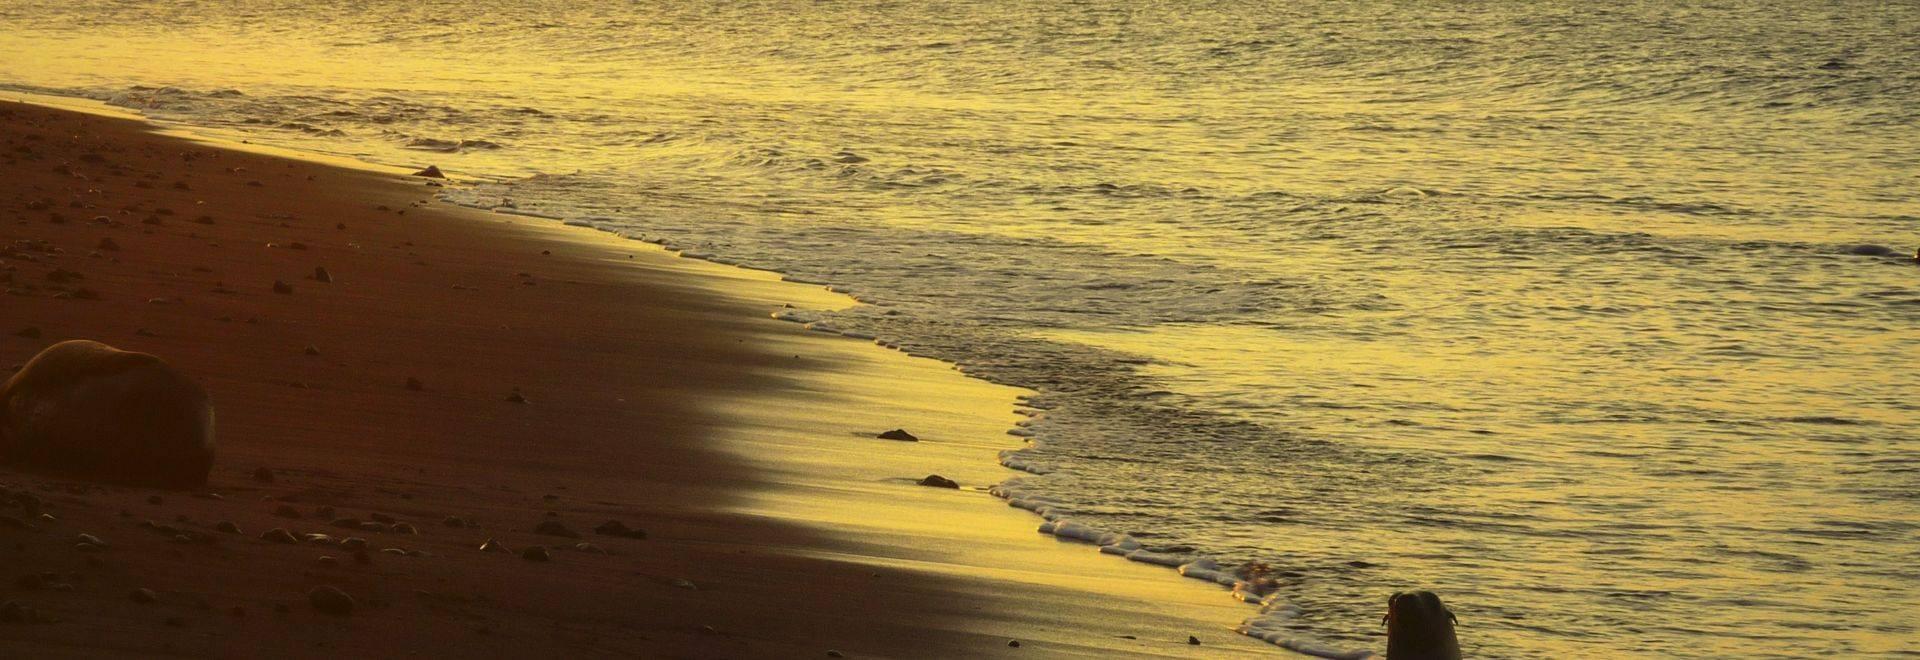 Galapagos Shore Sunset Seal Boat Silhouette-Omar Medina 2014-P1070628 Lg RGB.jpg